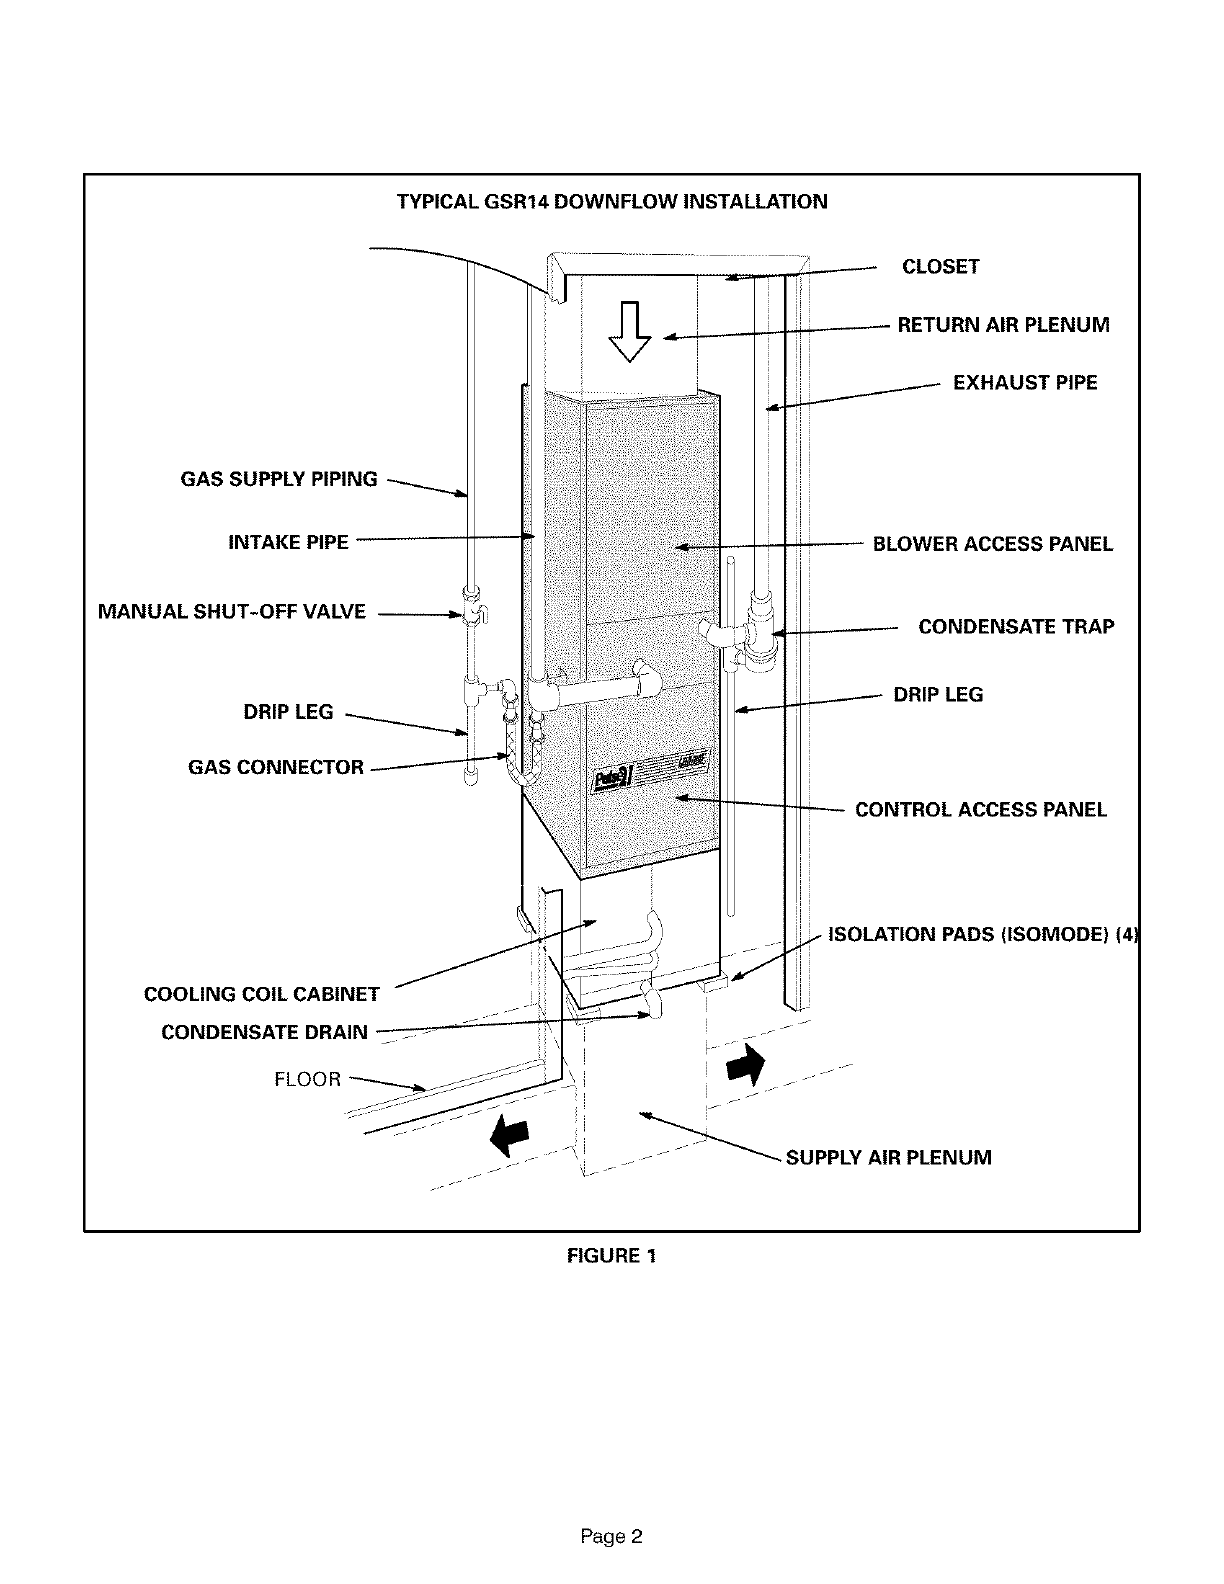 LENNOX Furnace/Heater, Gas Manual L0806891   Gsr14 Wiring Diagram For Lennox Furnace      UserManual.wiki